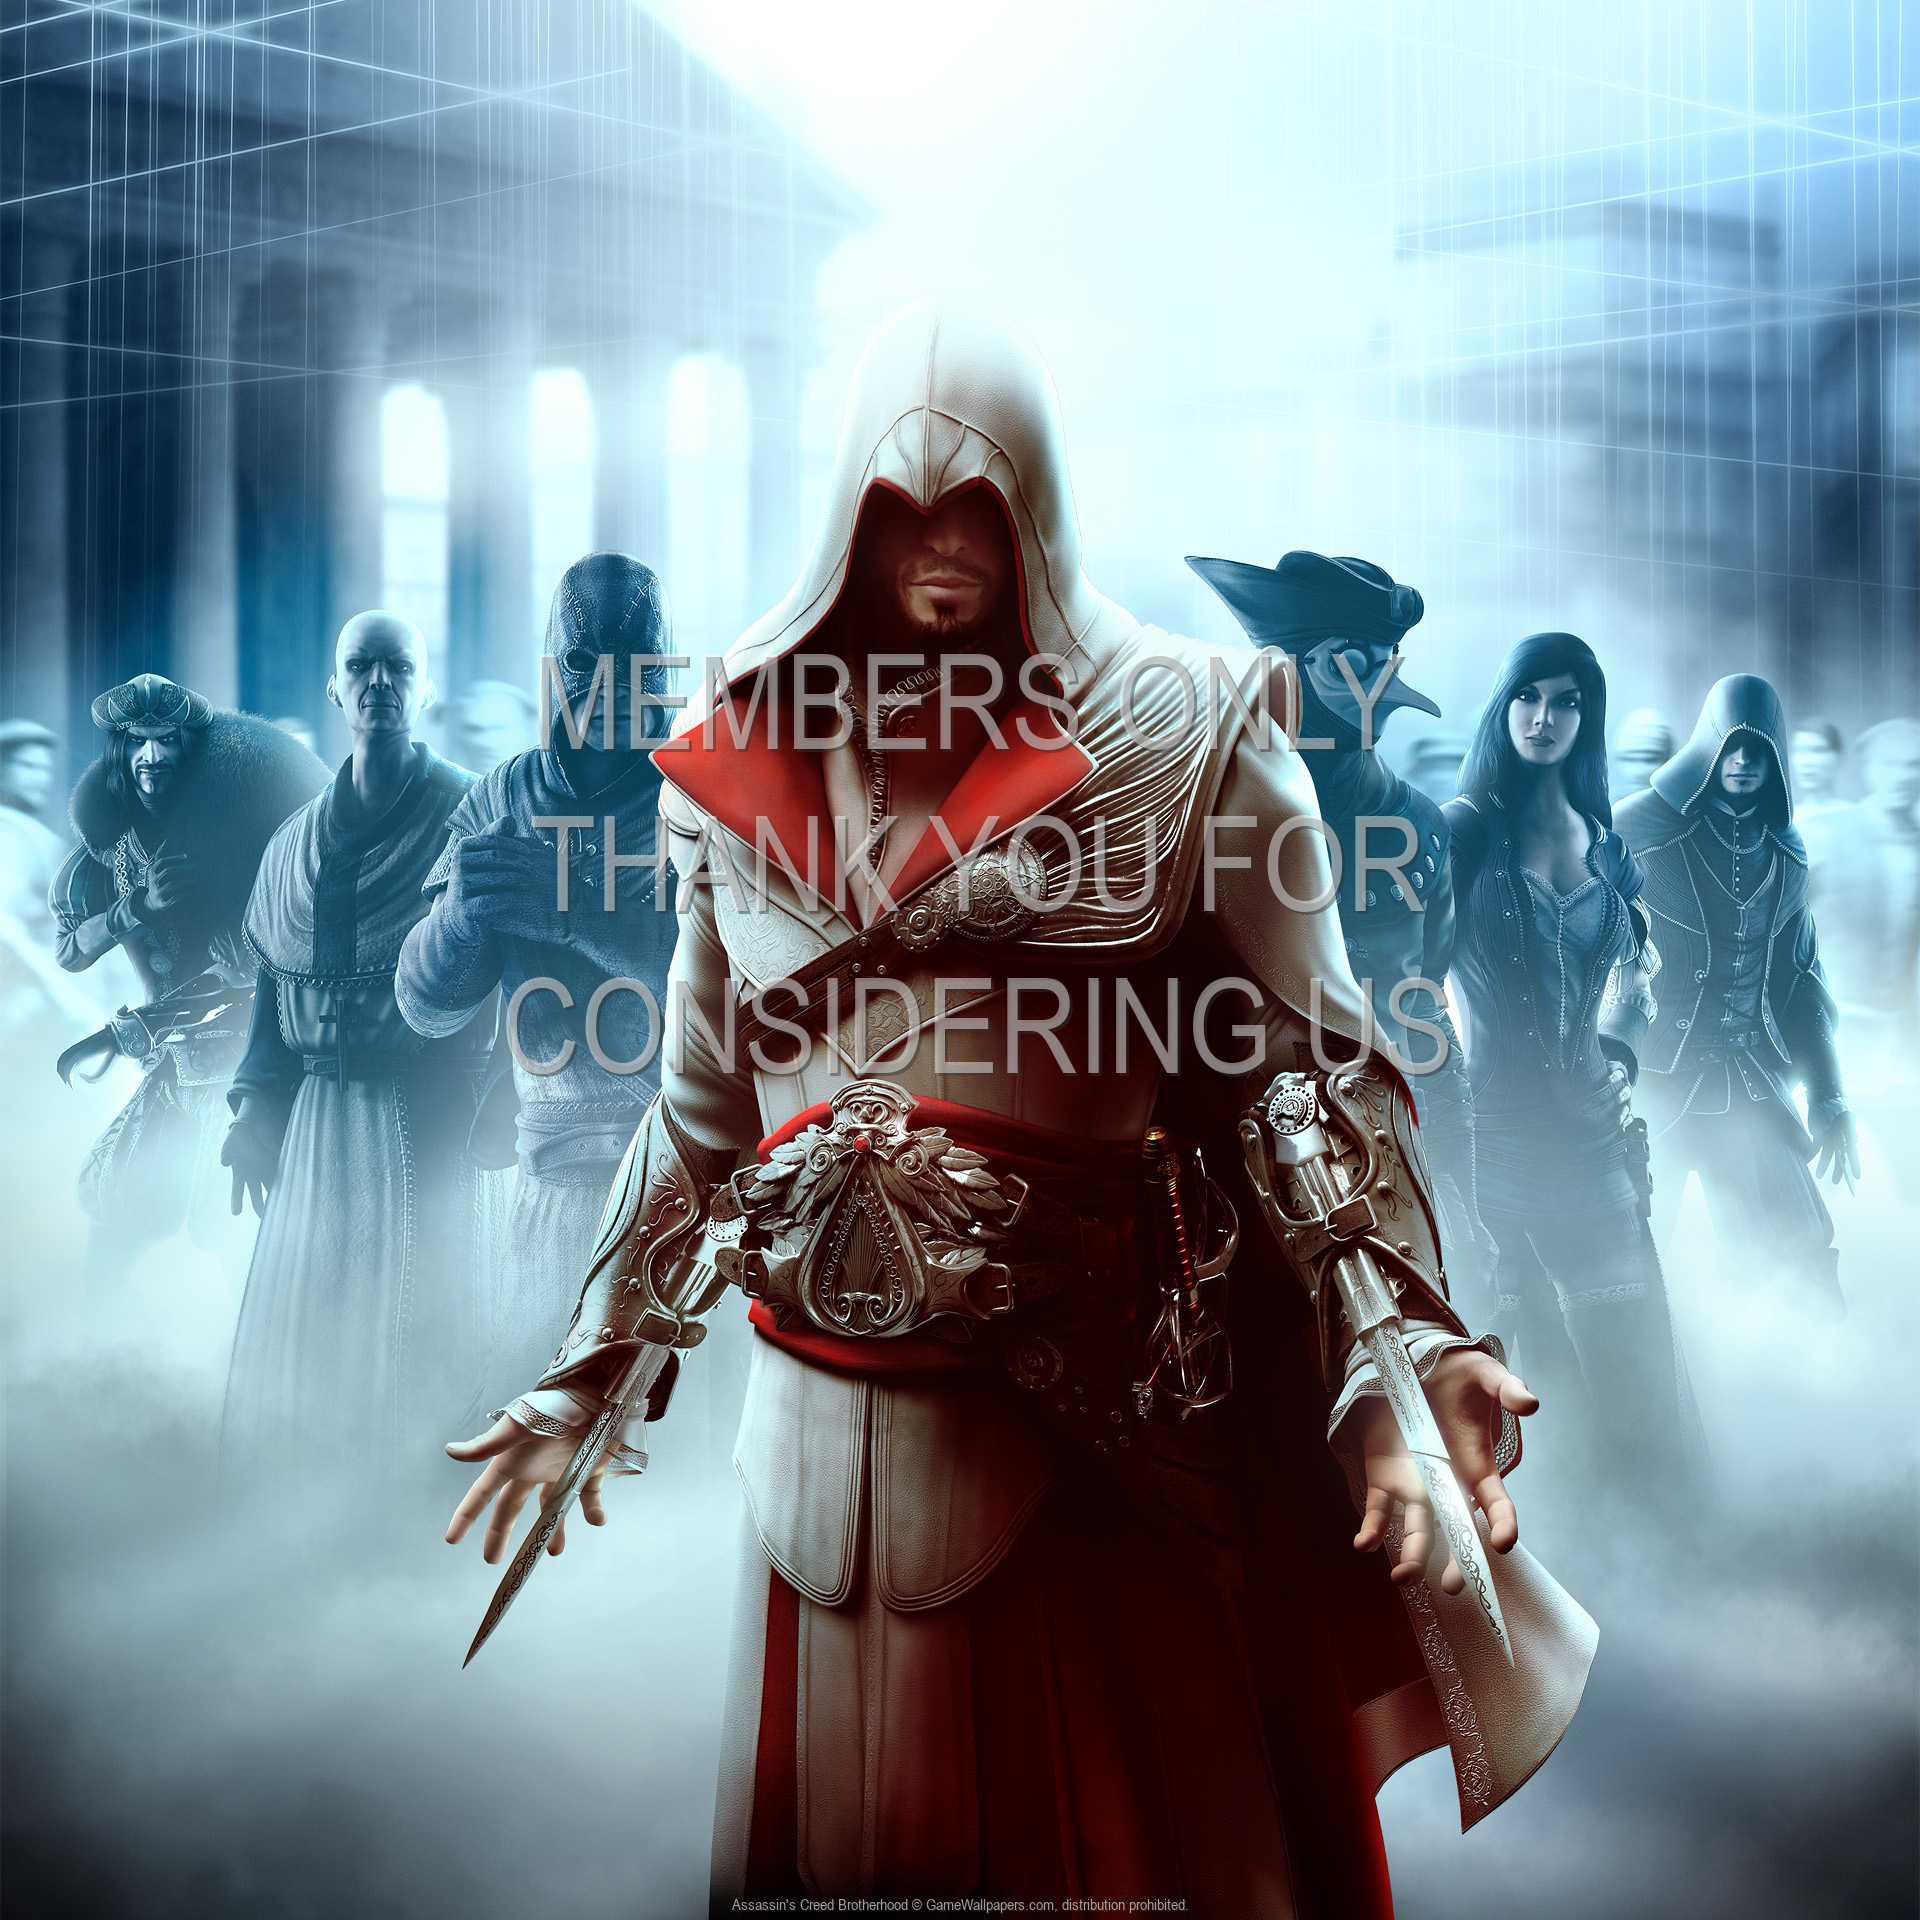 Assassin's Creed: Brotherhood 1080p Horizontal Mobiele achtergrond 01